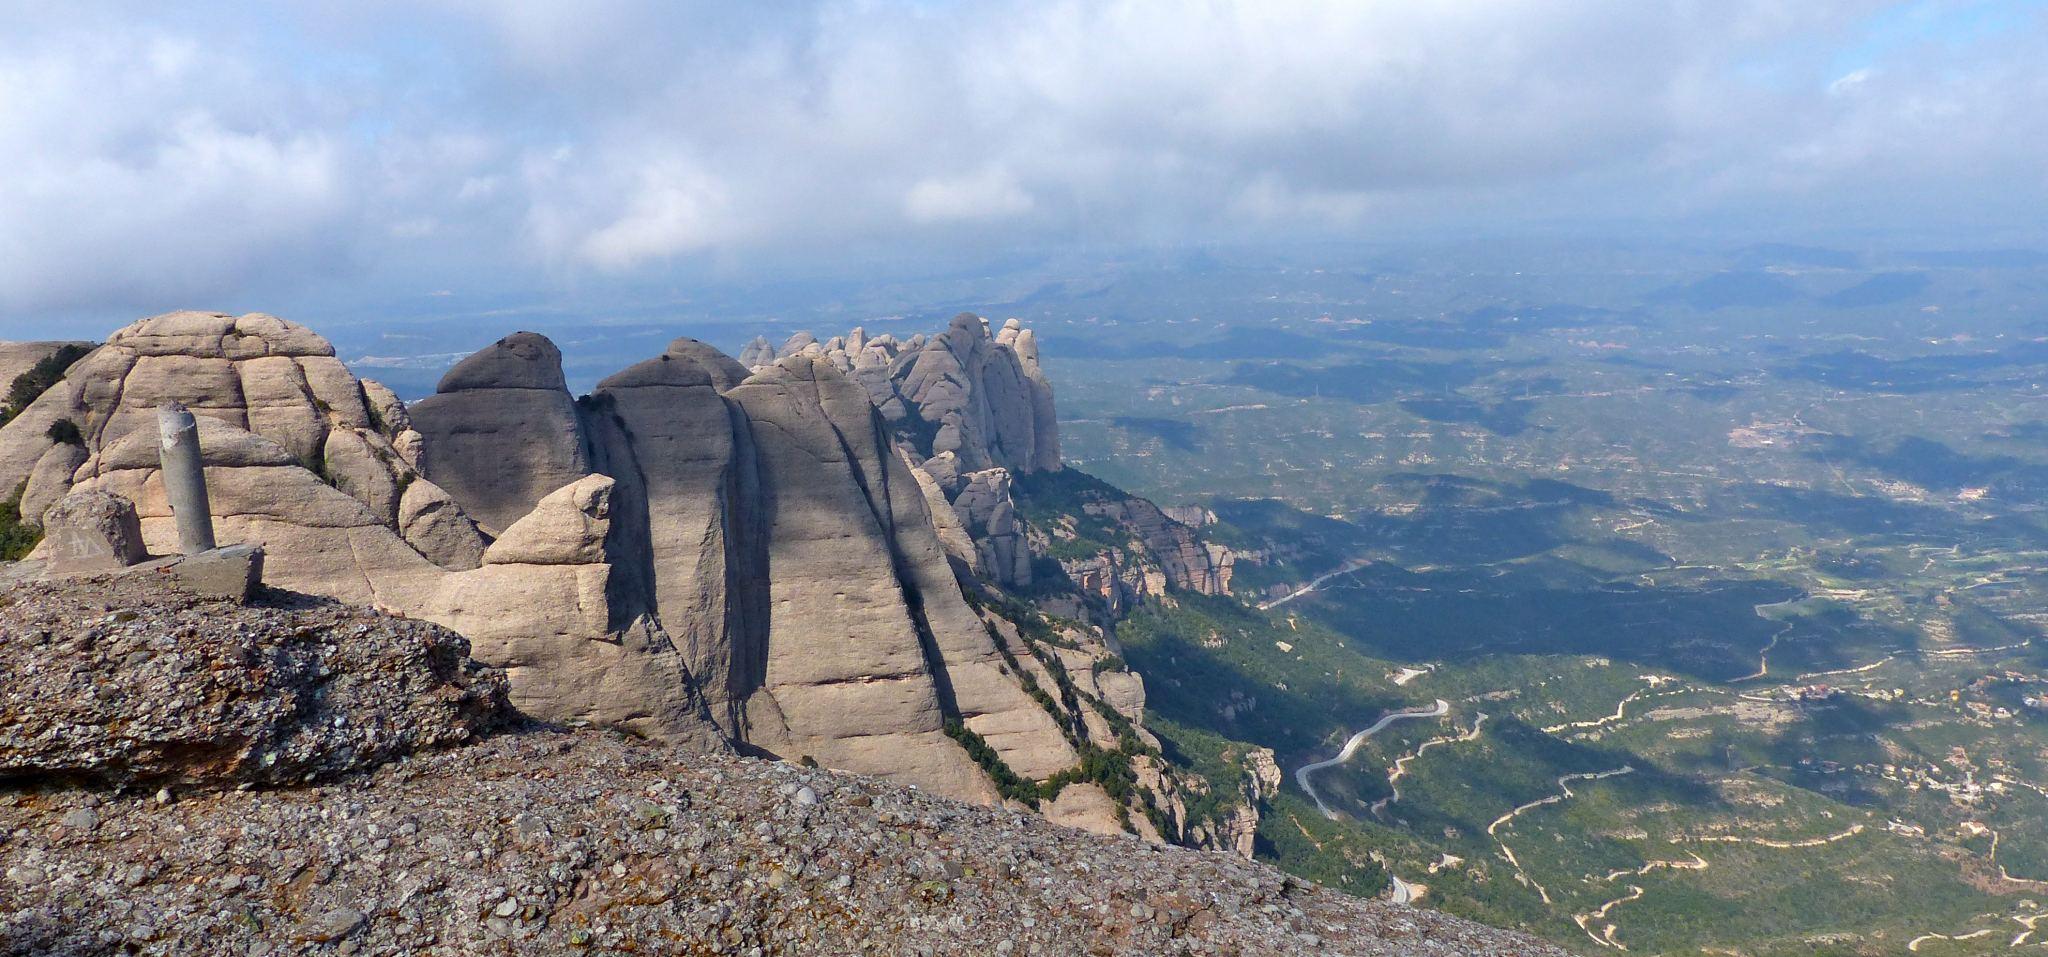 Montserrat Mountain, Barcelona